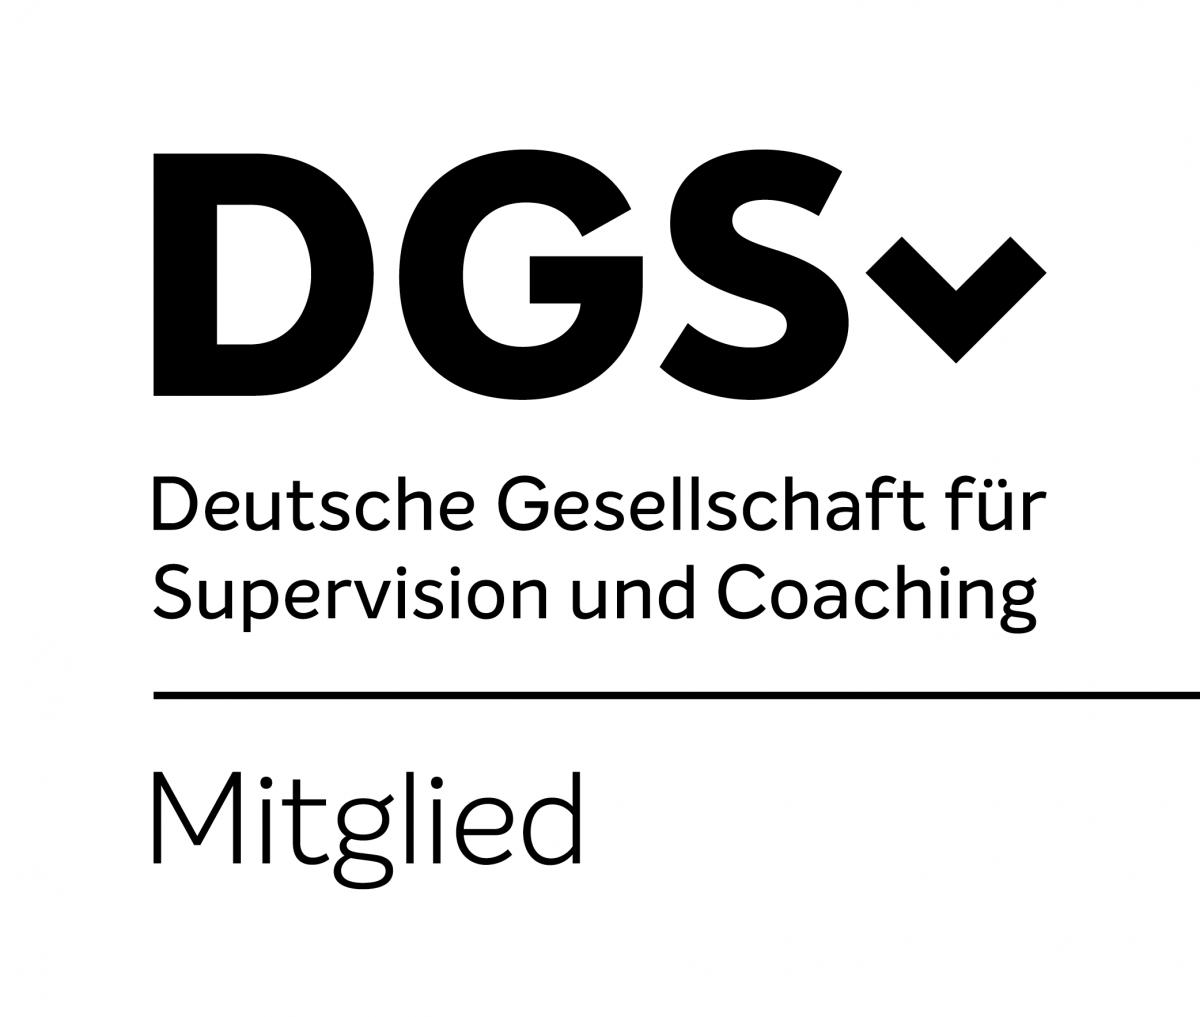 DGSv_Logo_Mitglieder_RGB_1000px_White-Black-1200x1017